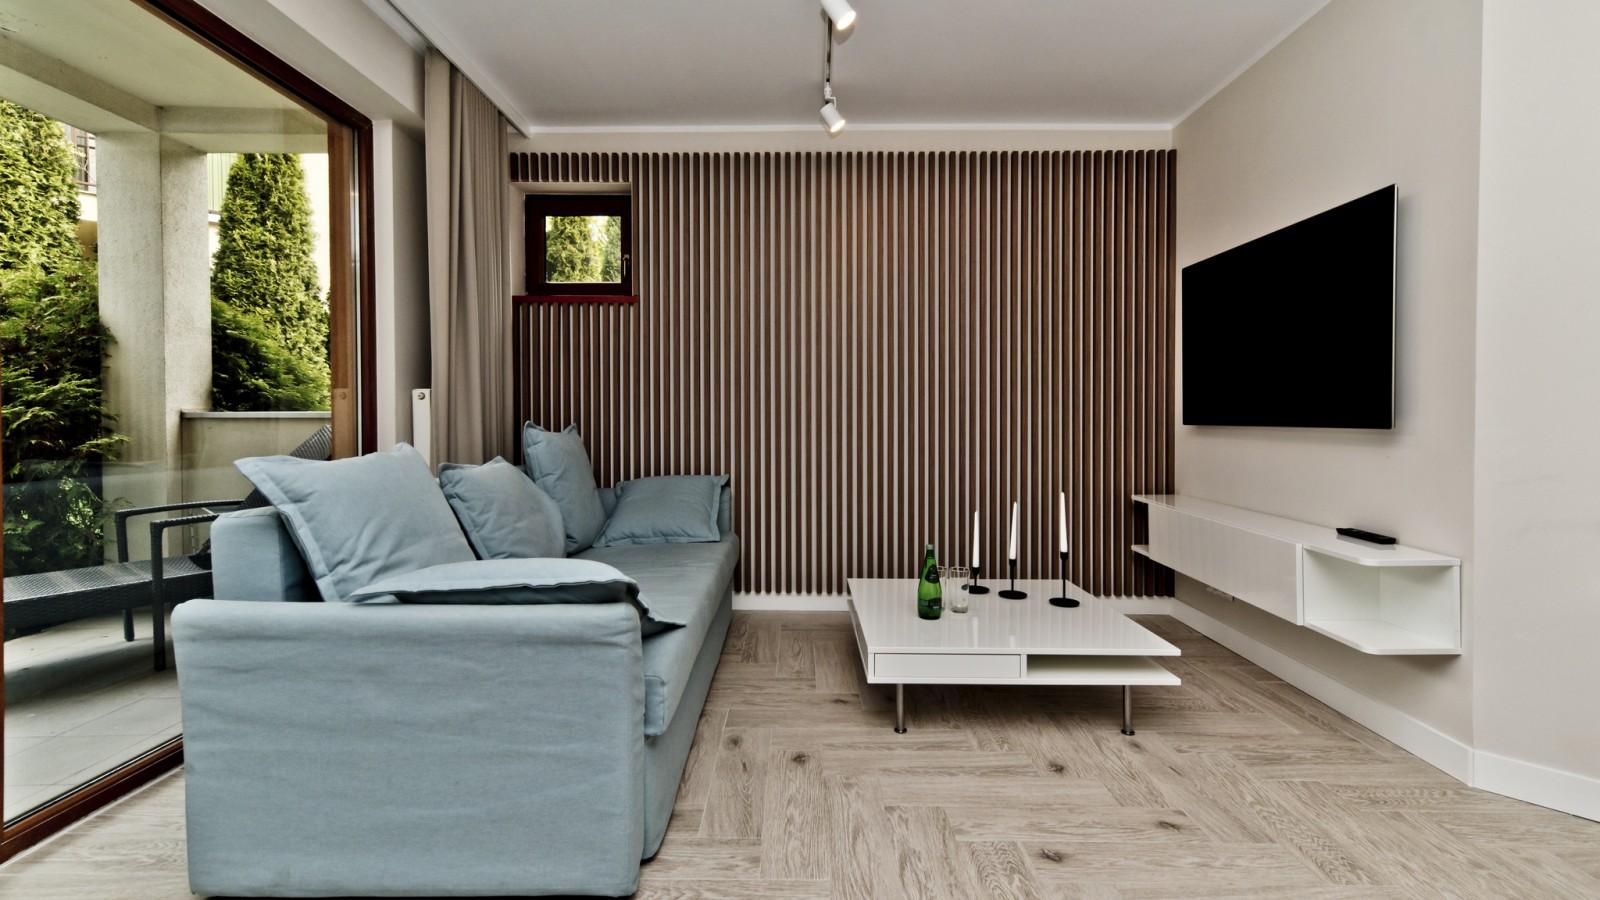 Apartament typu studio